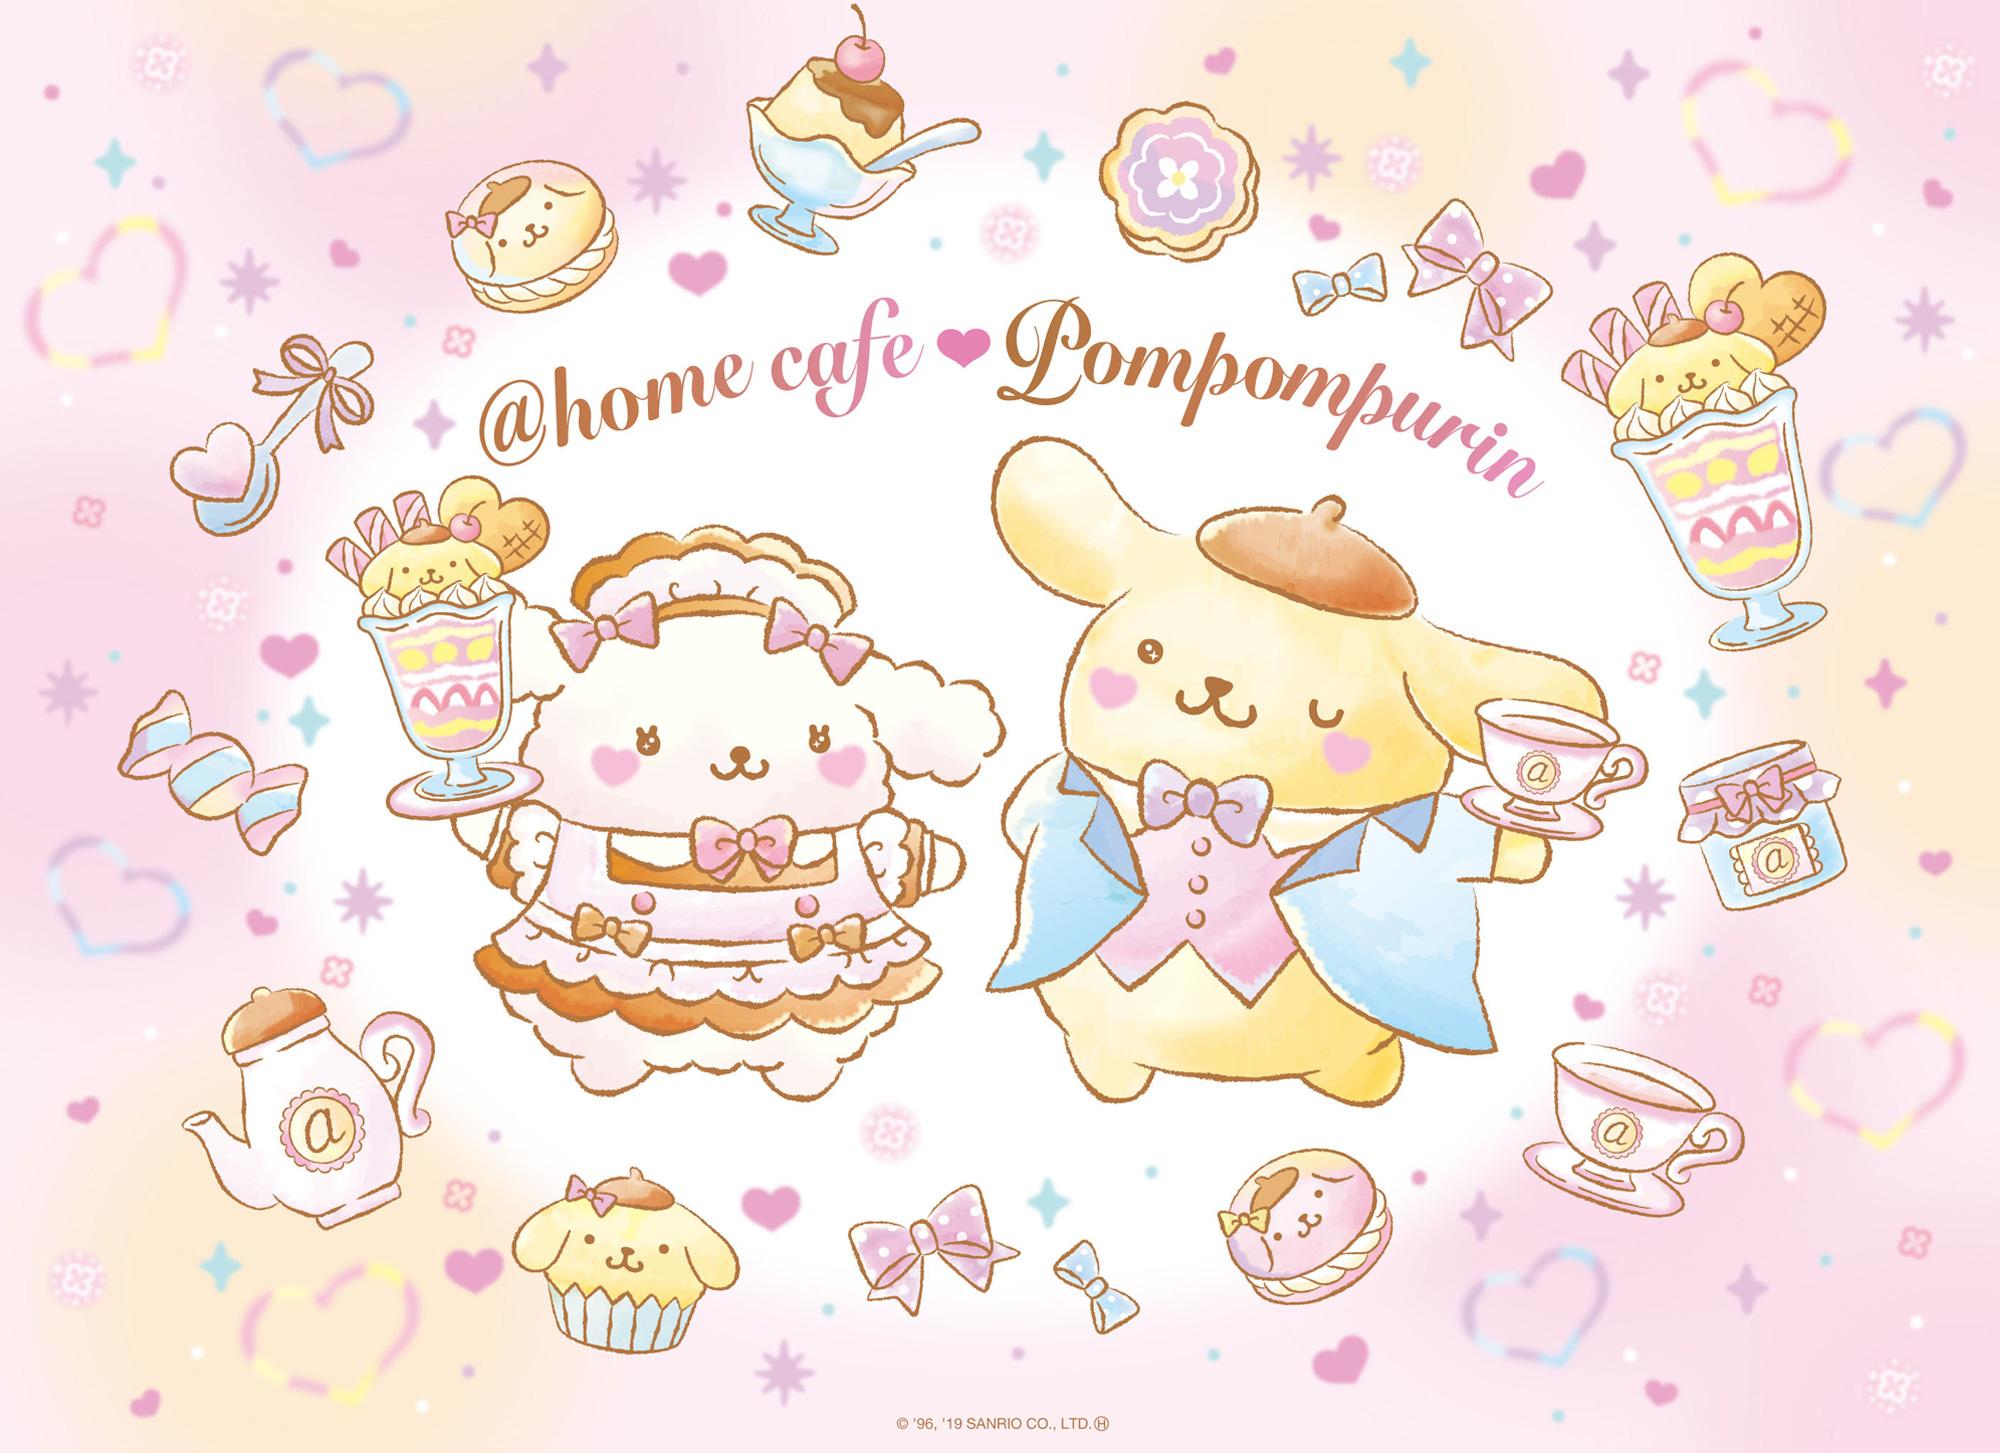 "[Pom pom pudding x maid]女仆咖啡厅""@ ho-mu m cafe""与Sanrio流行角色""pom pom pudding""合作!协作咖啡厅从6月4日(星期二)起举行!"